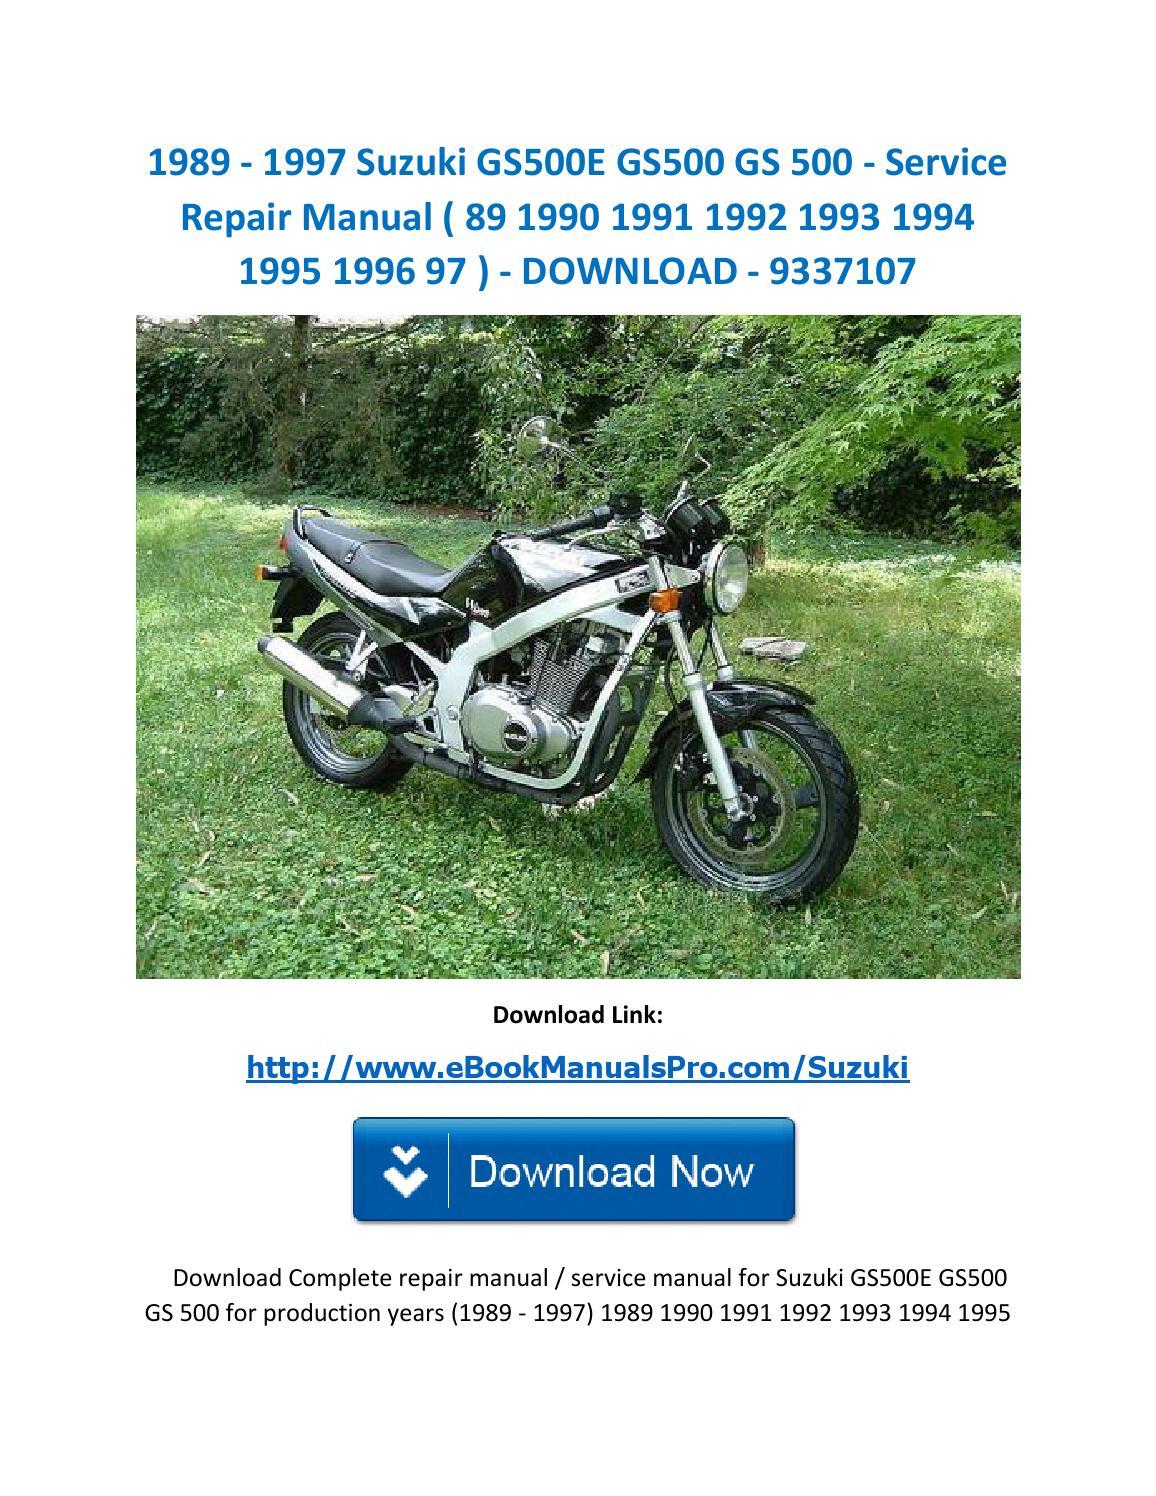 1989 1997 Suzuki Gs500e Gs500 Gs 500 Service Repair Manual